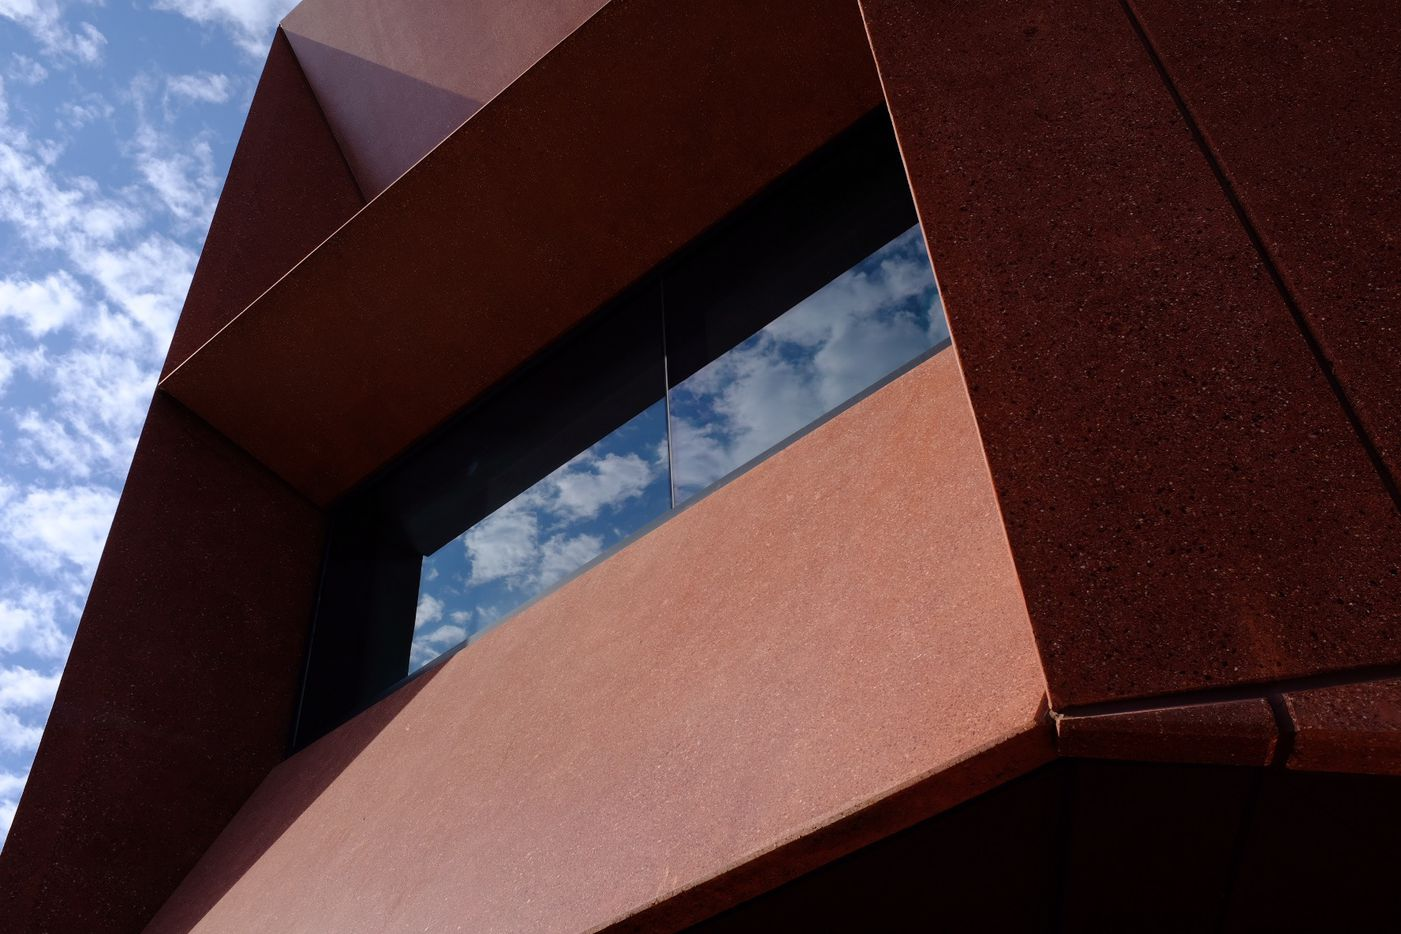 Shadows and reflections on the chiseled concrete block of Ruby City, David Adjaye, architect.